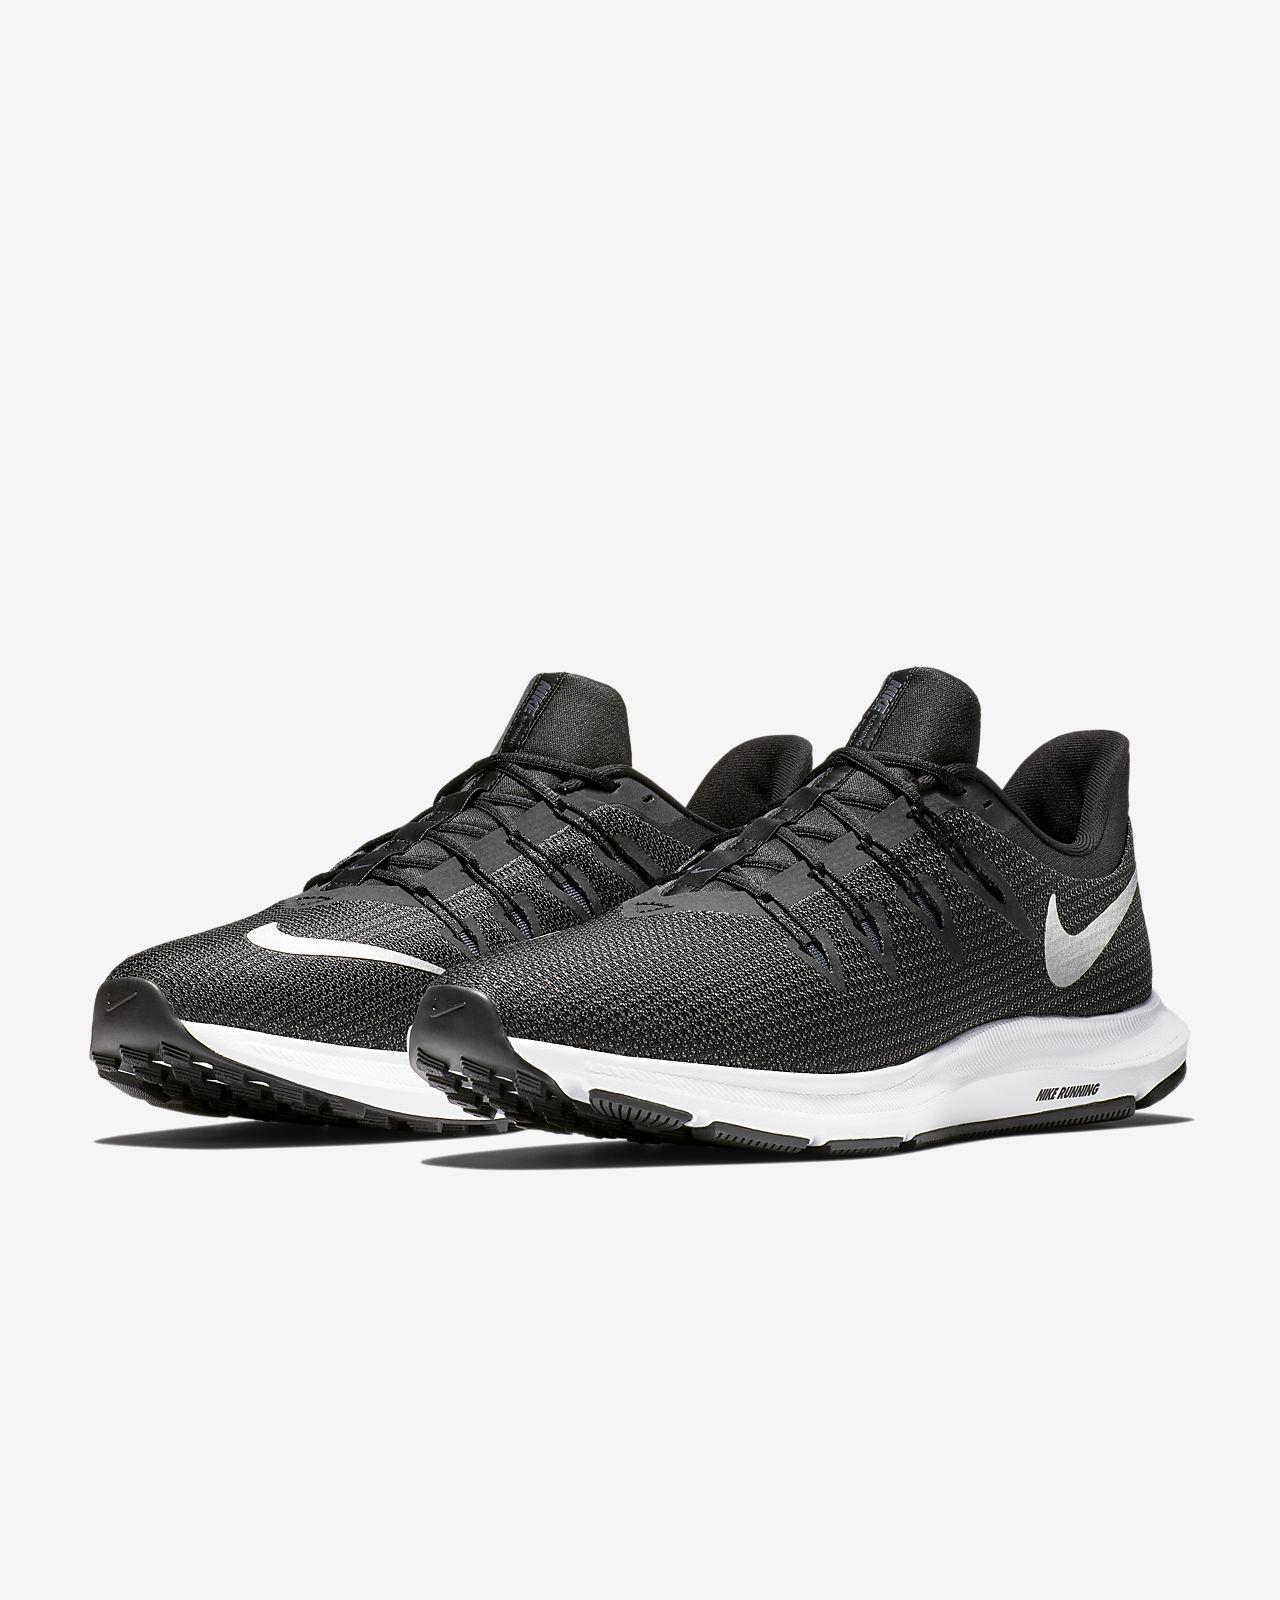 f0201e278f Ανδρικό παπούτσι για τρέξιμο Nike Quest. Nike.com GR